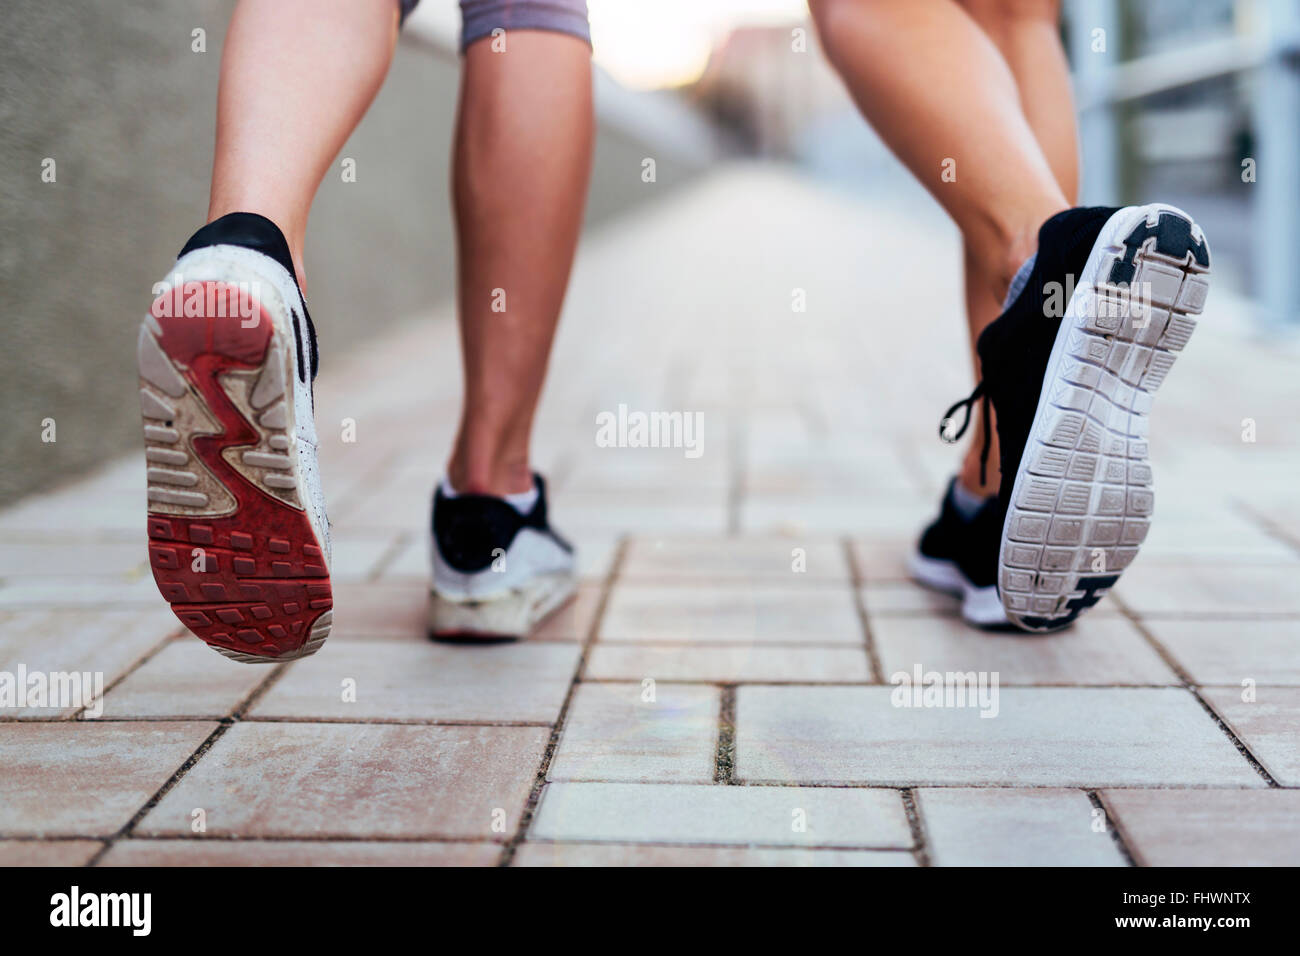 Jogging athletic women - closeup on legs - Stock Image